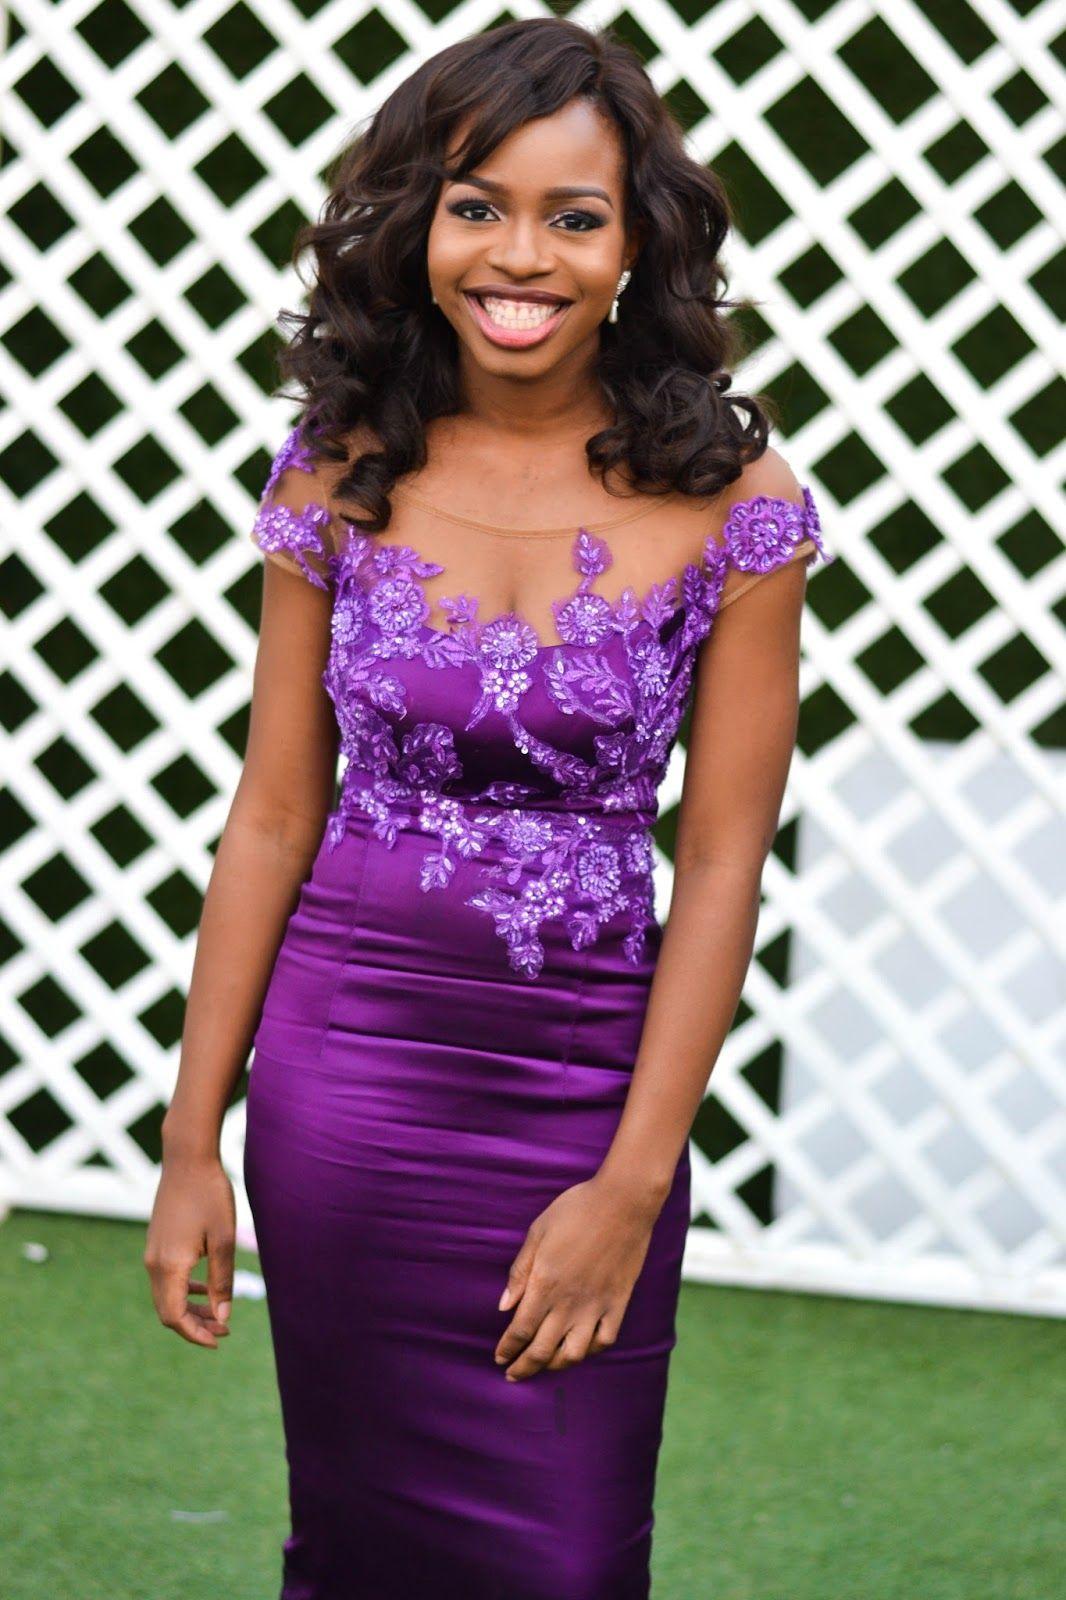 A Pretty Purple Bridesmaid Dress | Purple lace bridesmaid dresses ...